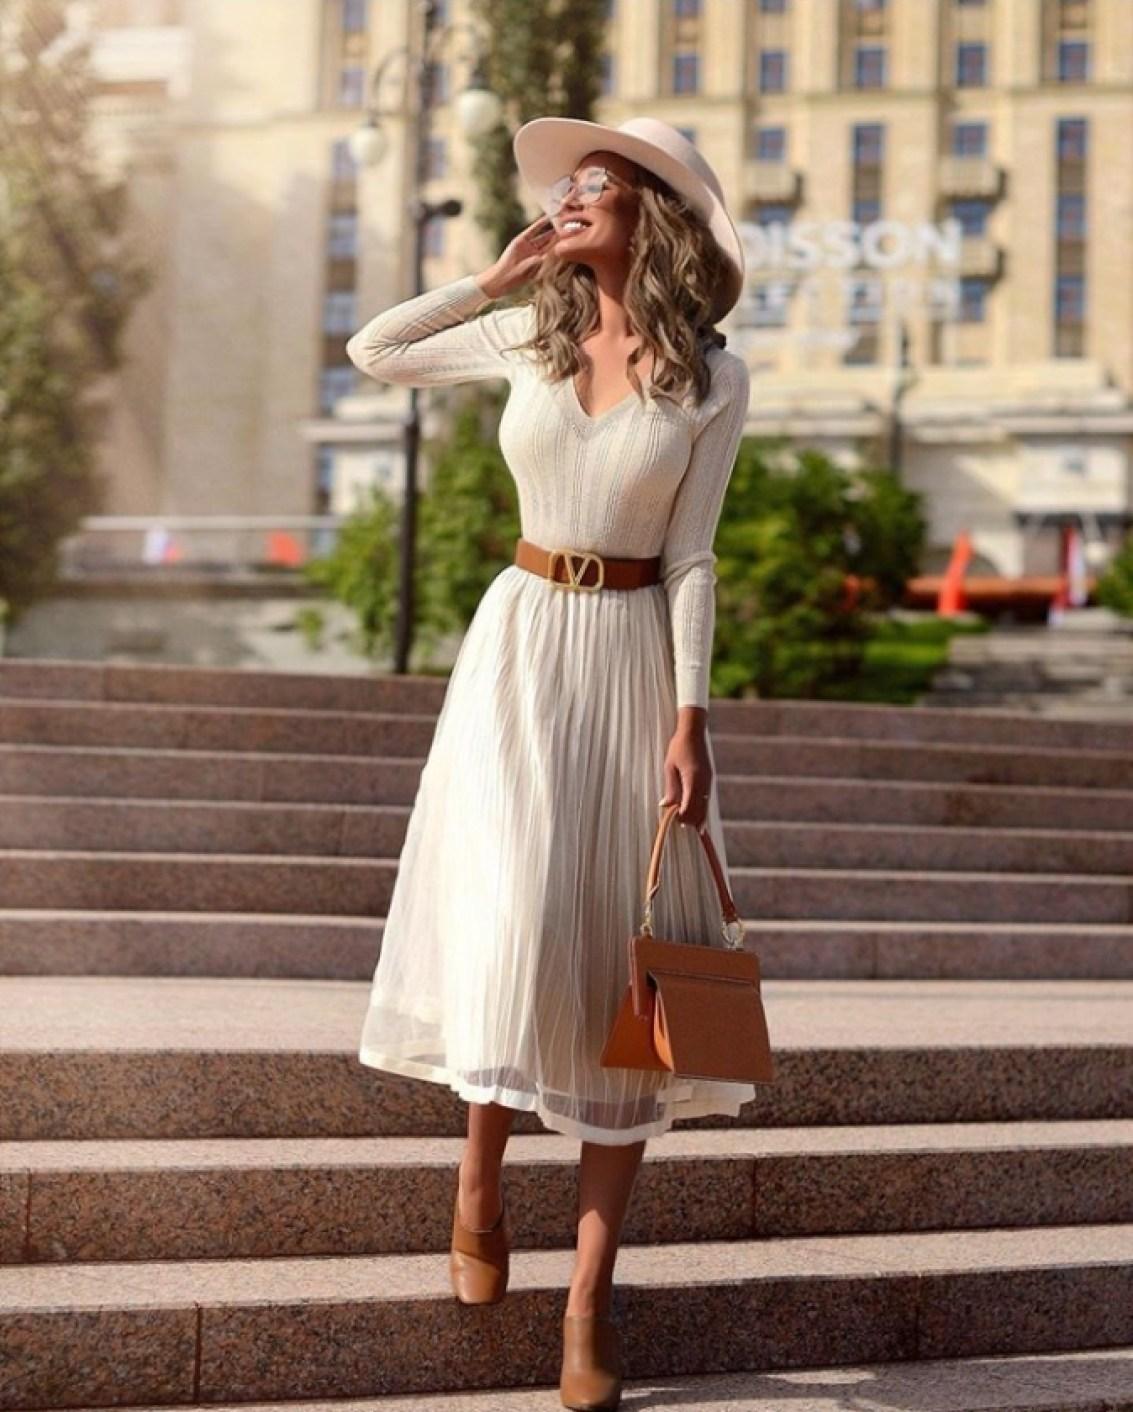 How to Style Vintage Dresses & Look Elegant